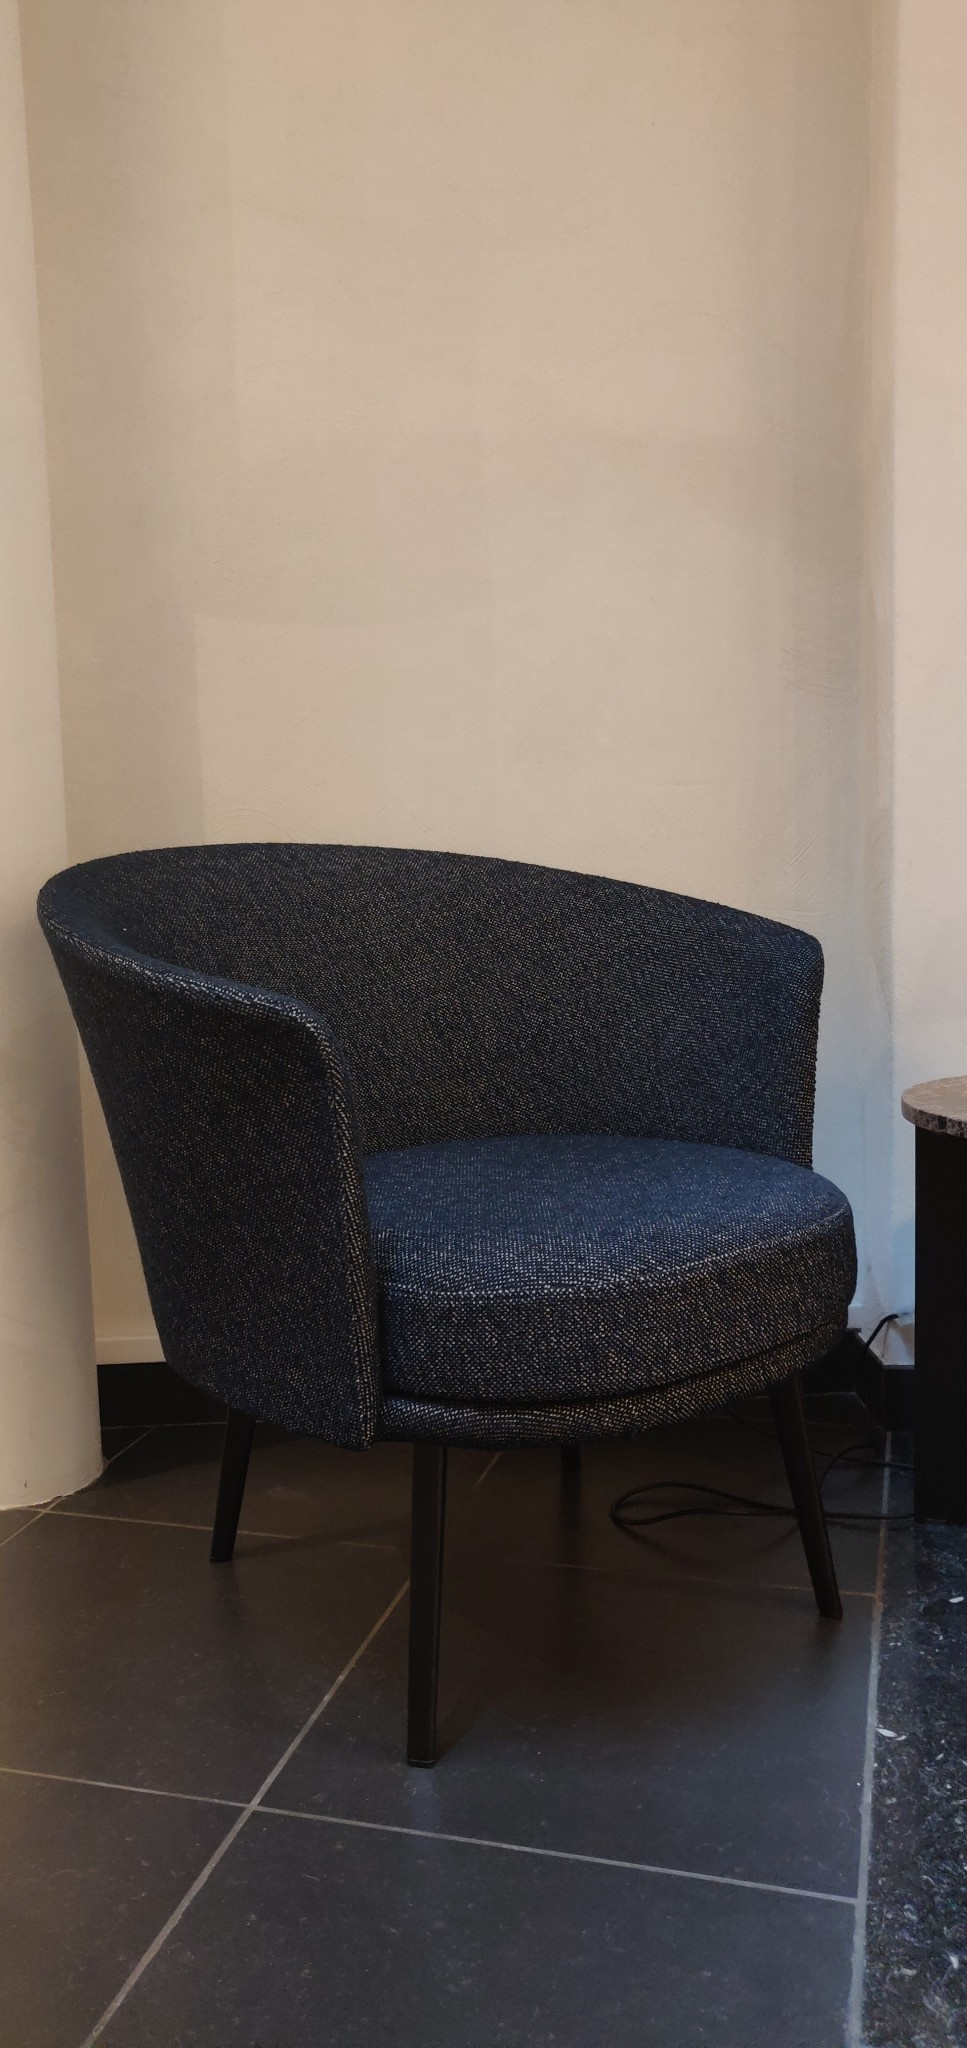 Toonzaalmodel Dorso BLACK POWDER COATED STEEL - FAIRWAY DARK BLUE 308-288-1